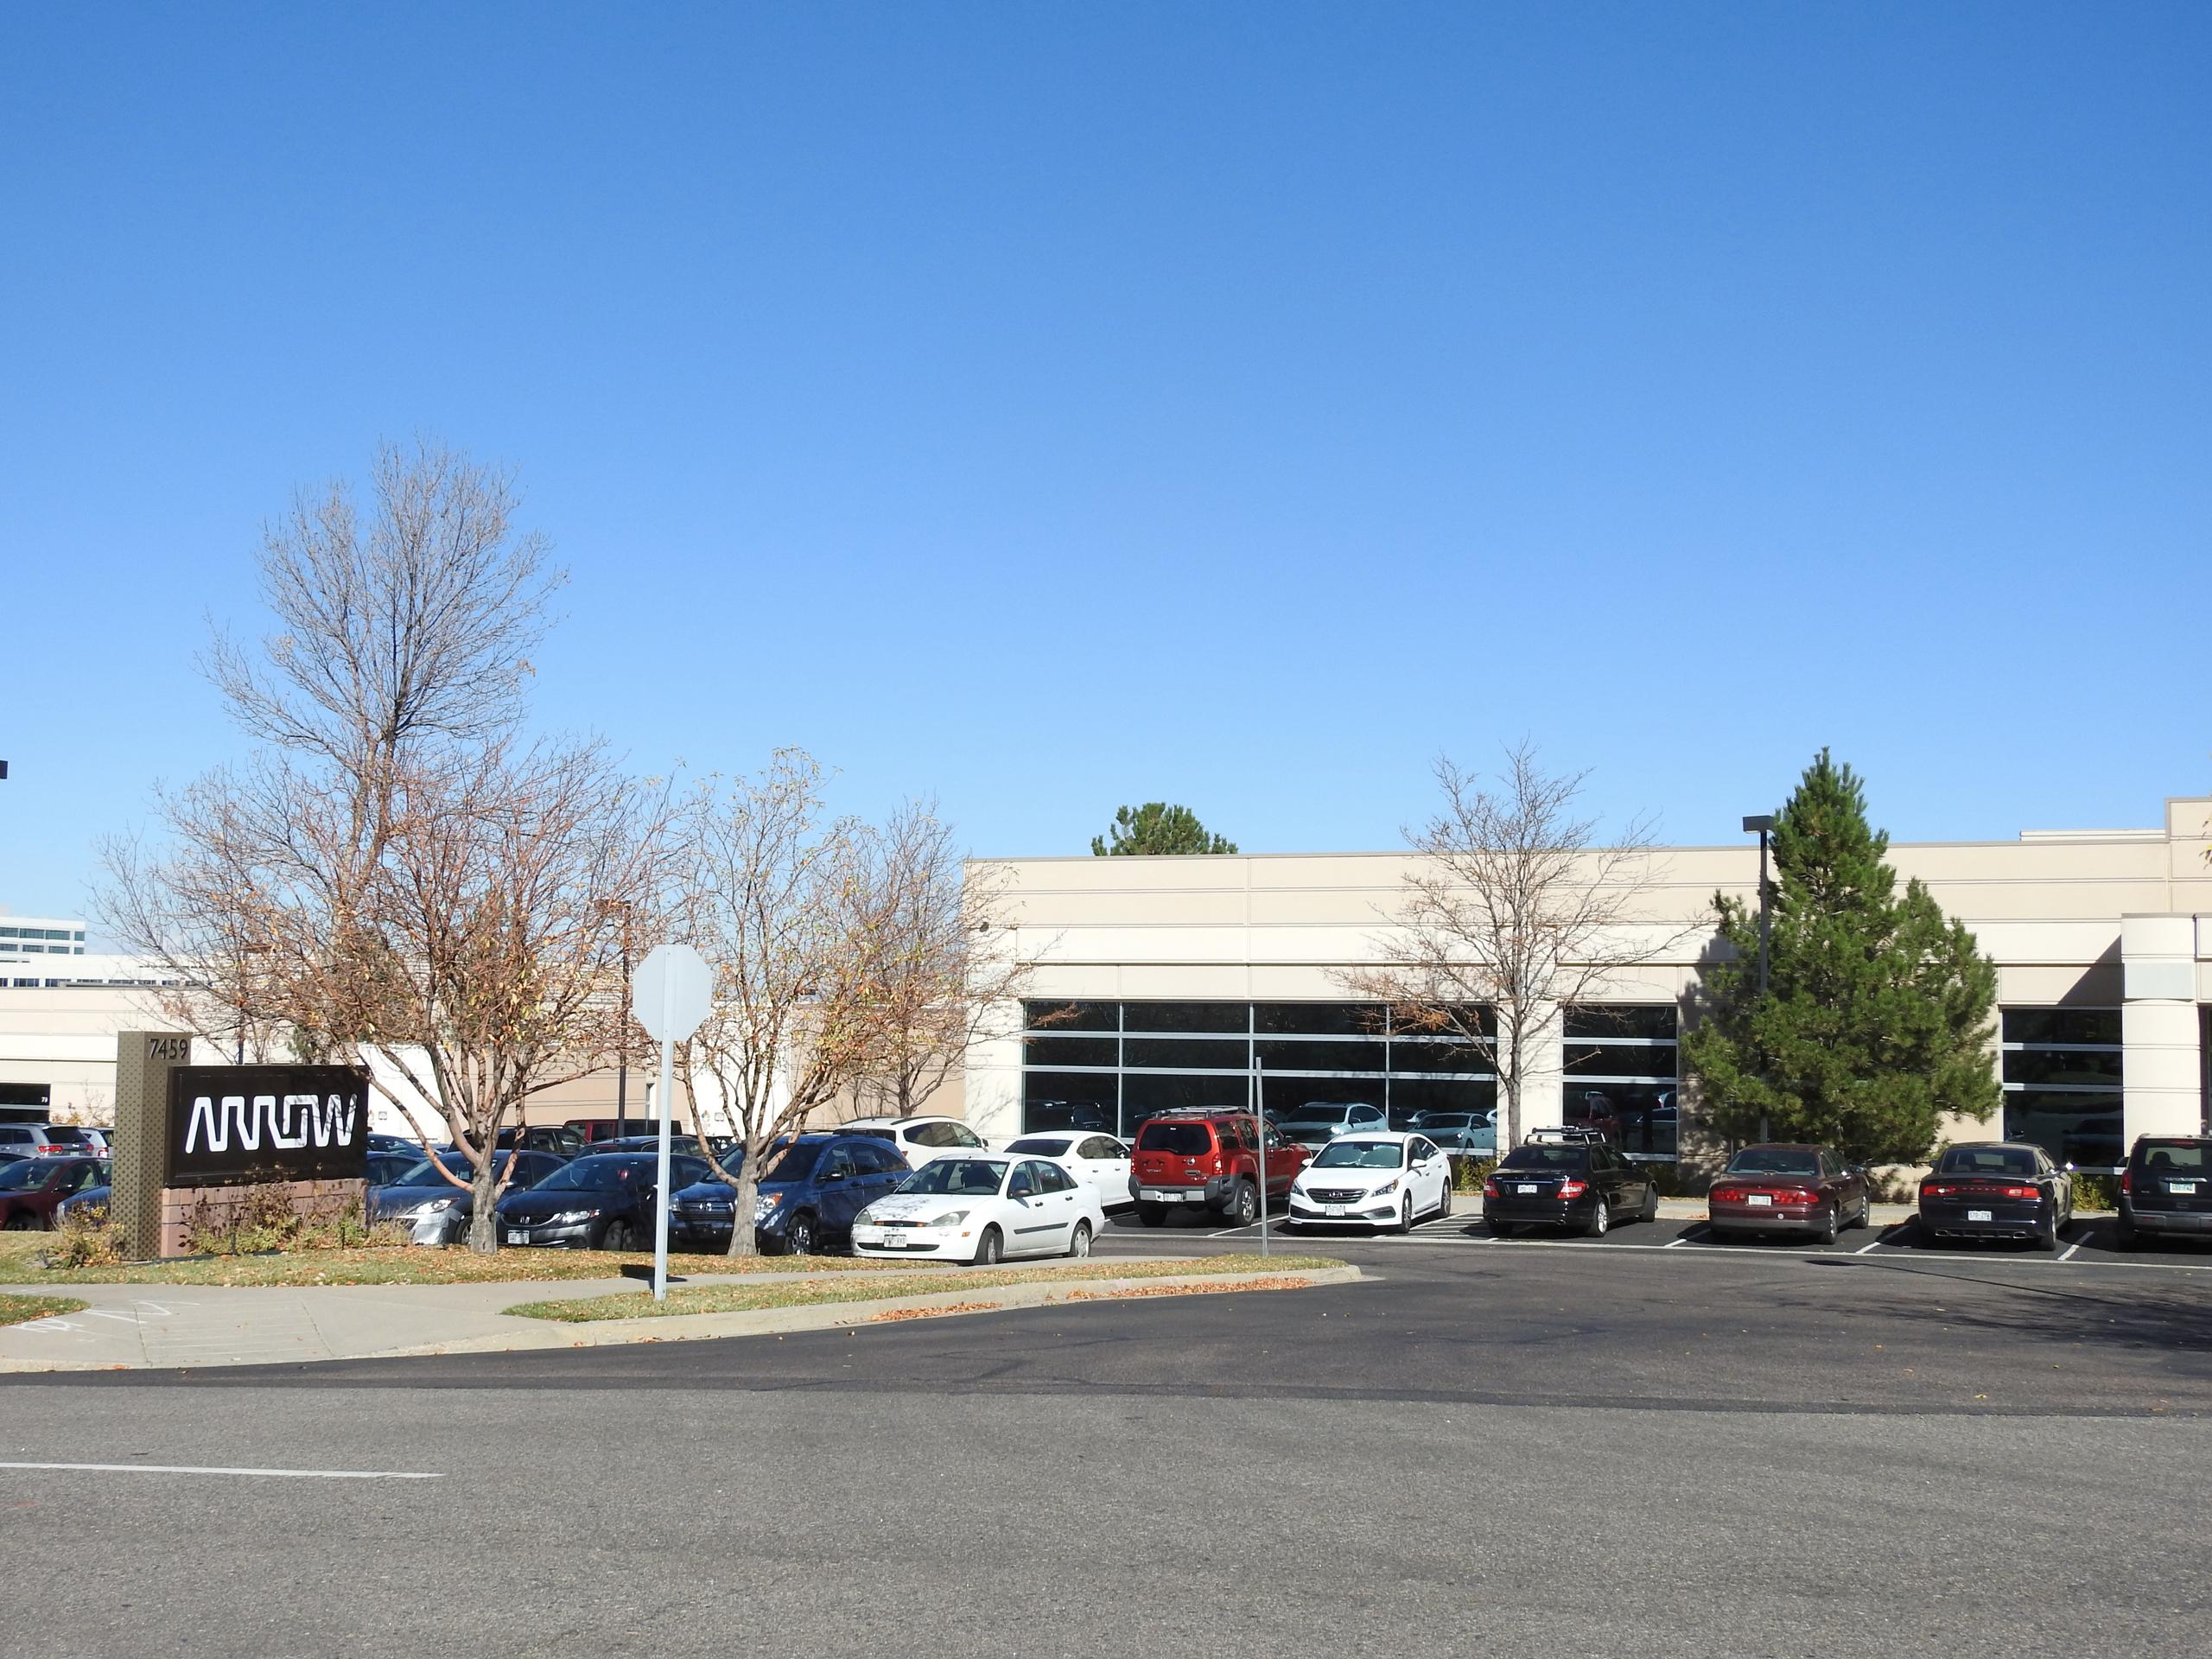 Arrow Electronics office in Englewood, Colorado.